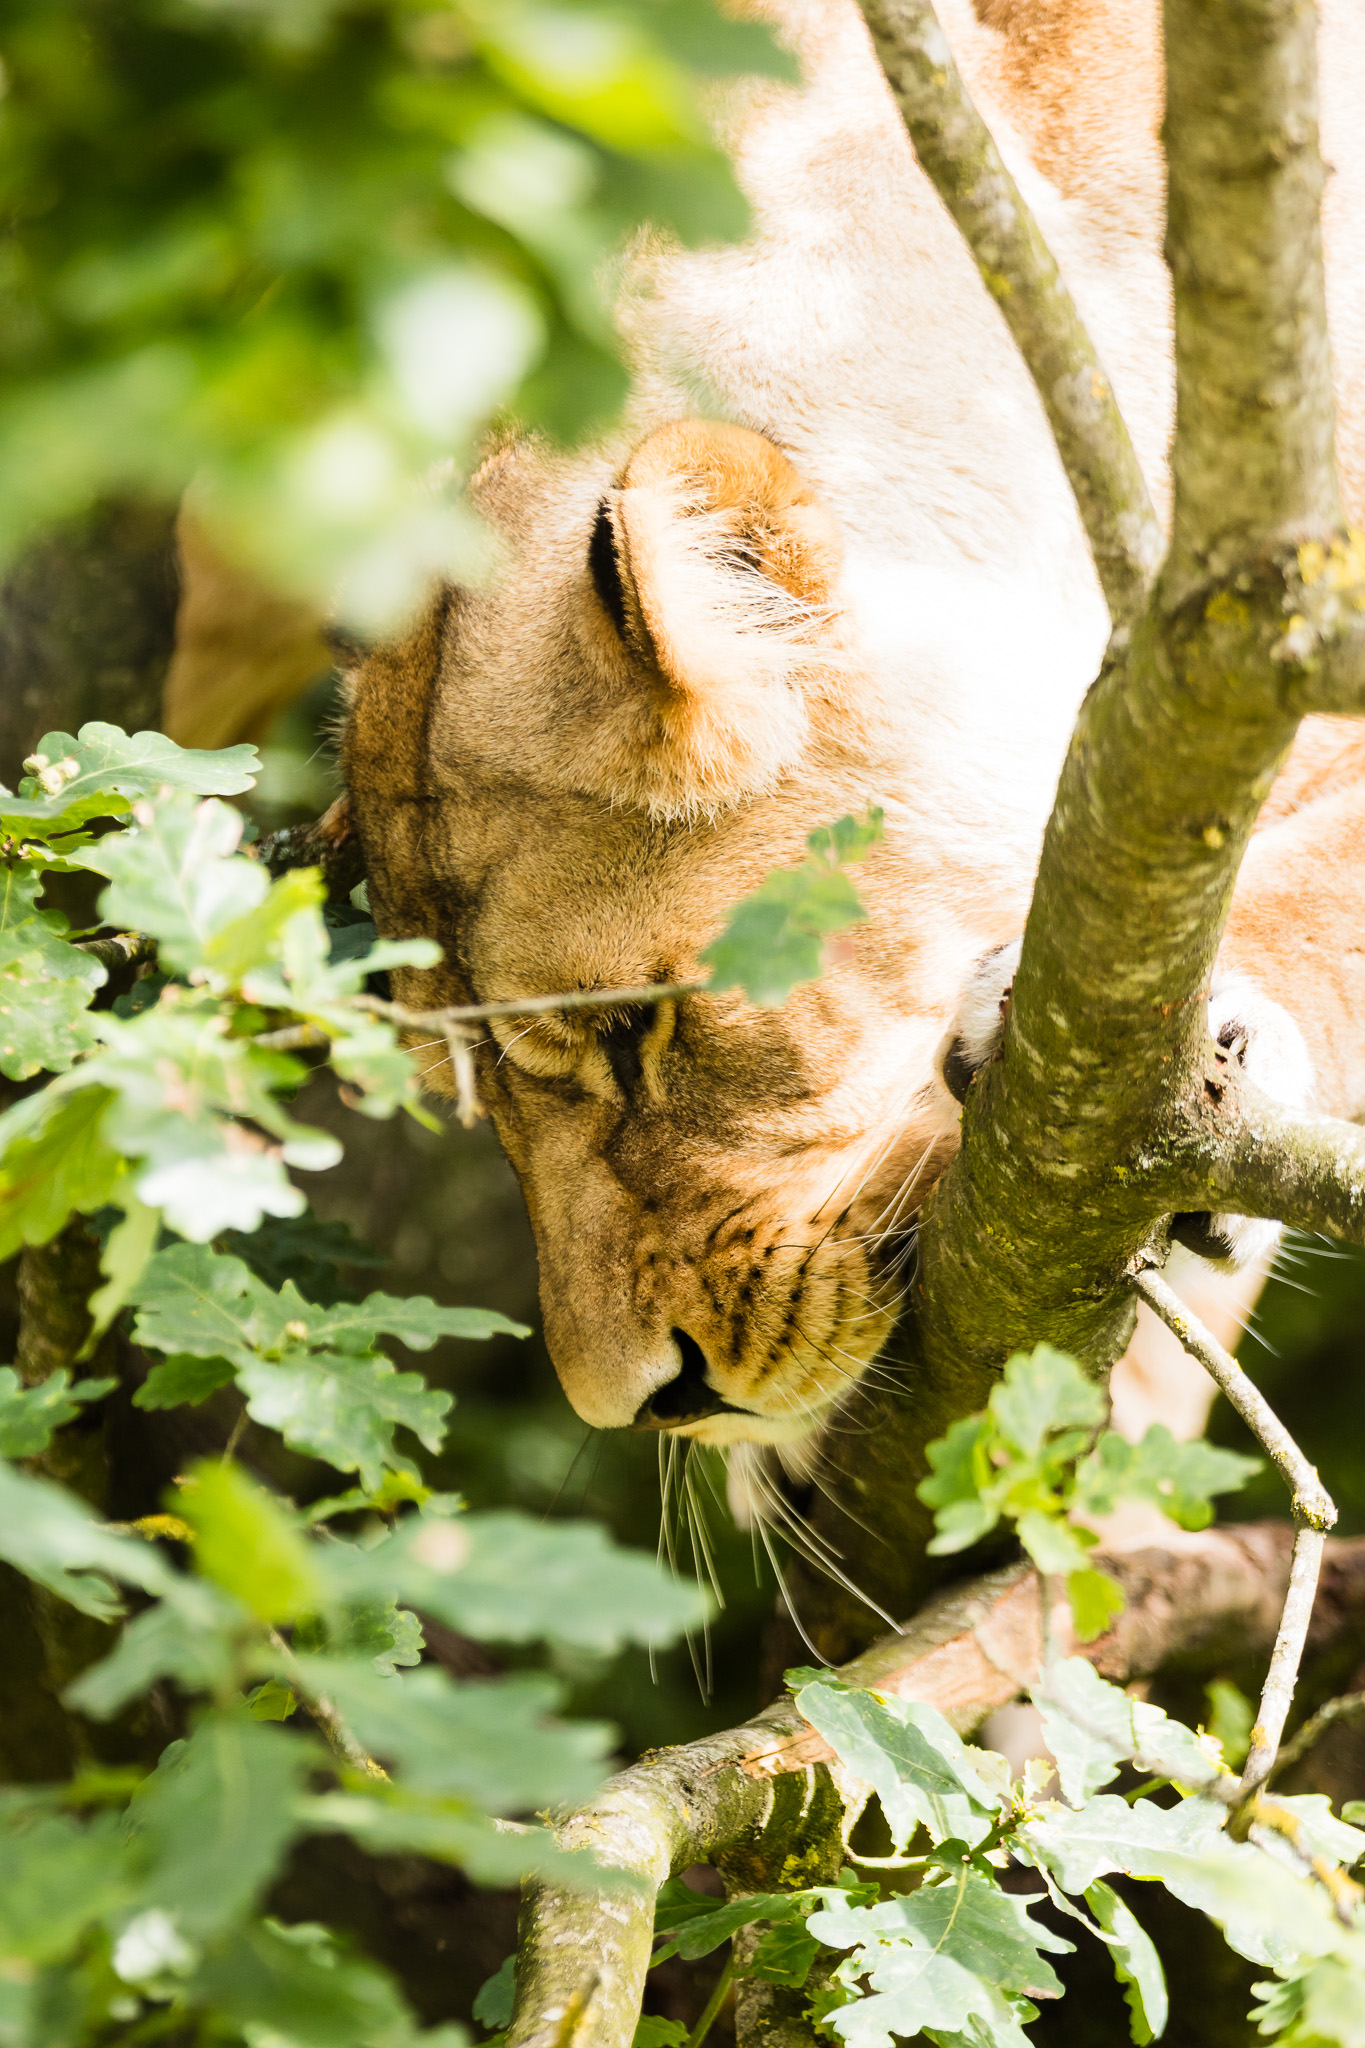 Givskud-Zoo-Safari-NorthernWorkshops-12.jpg